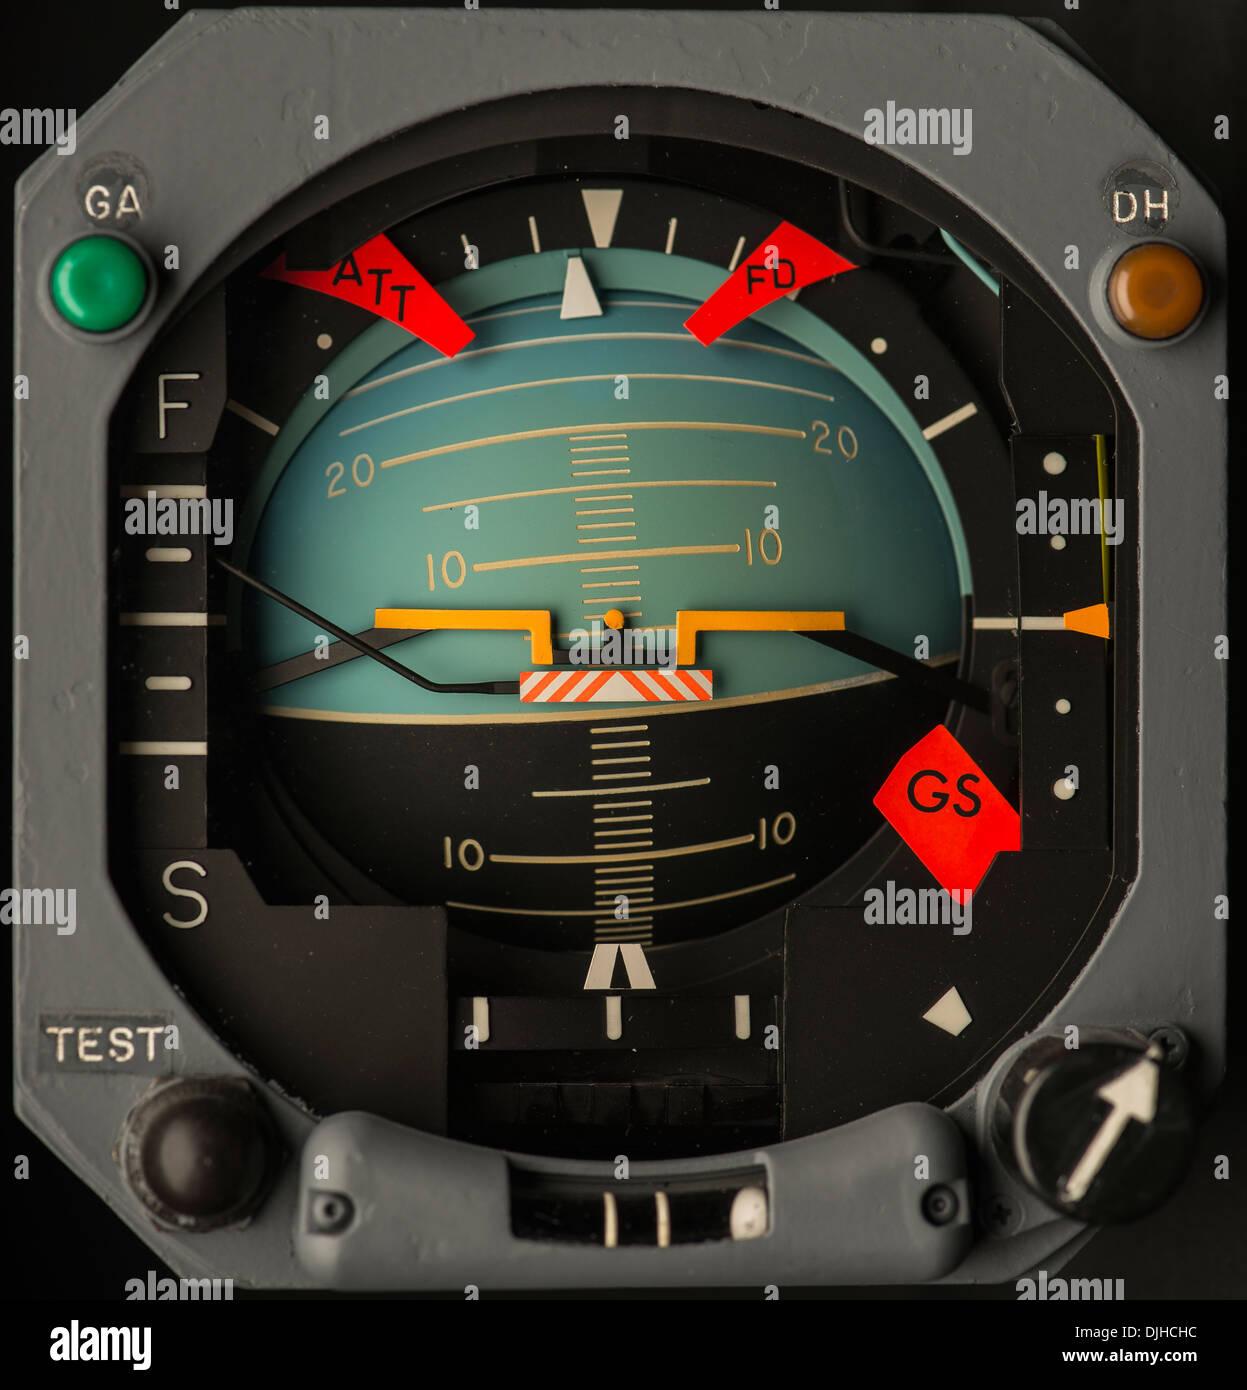 Boeing 747 Attitude display indicator ADI - Stock Image